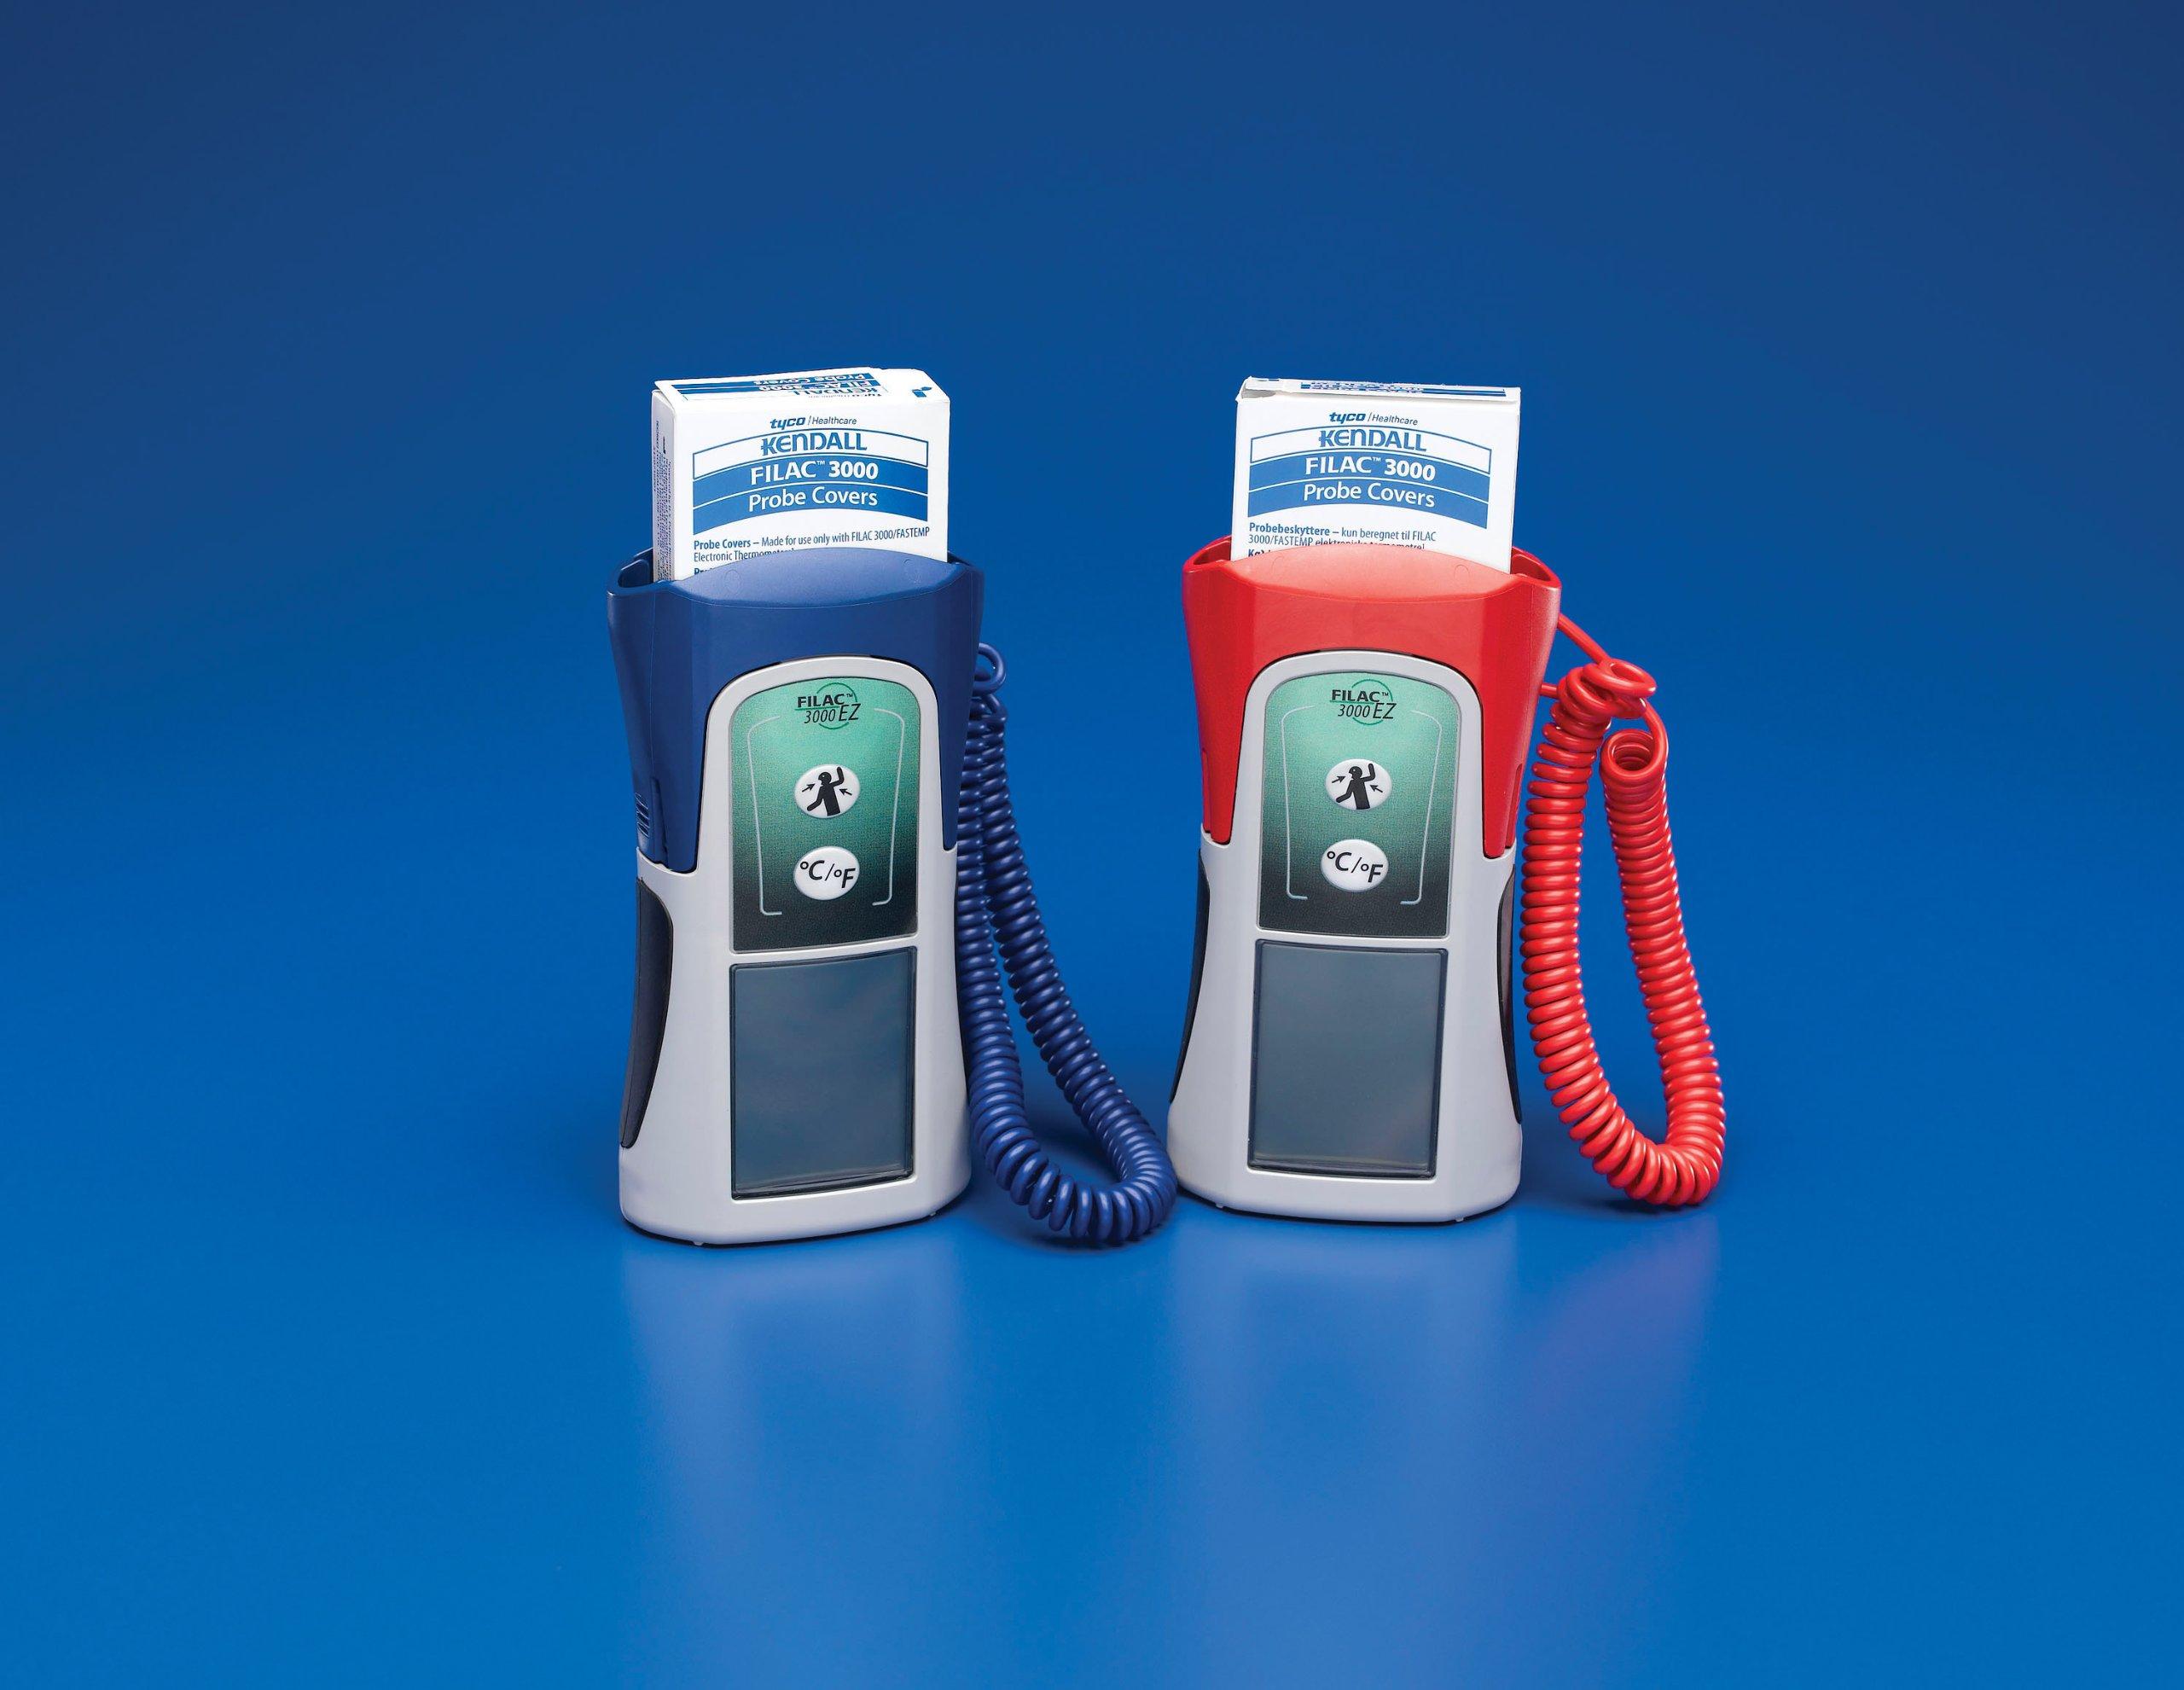 Filac 3000 EZ Oral / Axillary Complete Unit